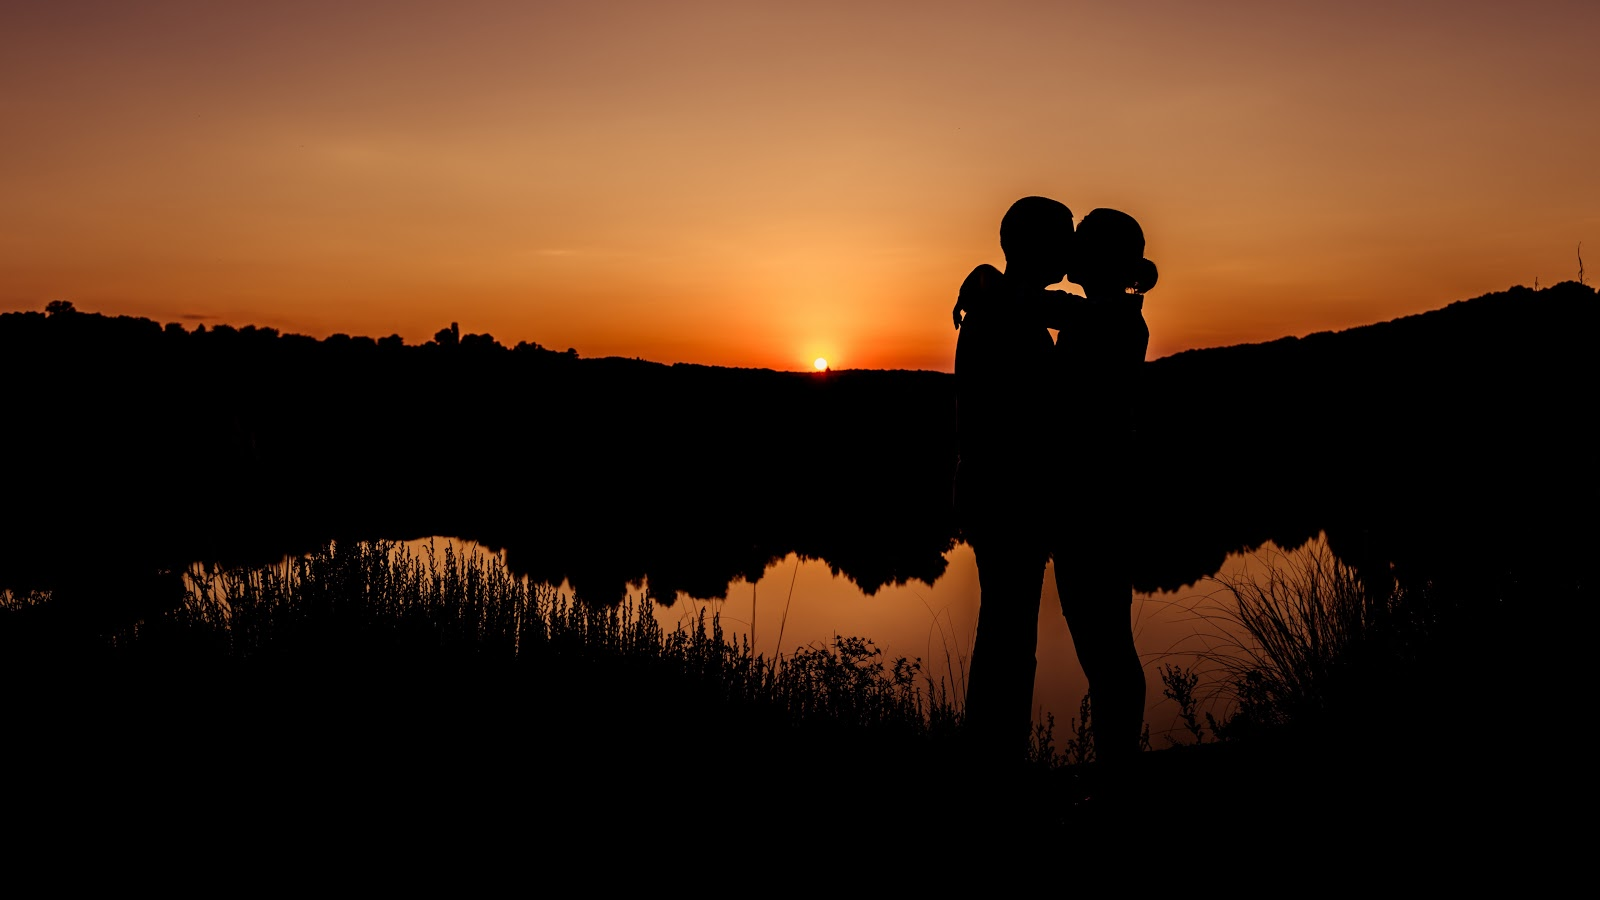 love couple kiss images | 50+ romantic hd wallpapers, pics whatsapp